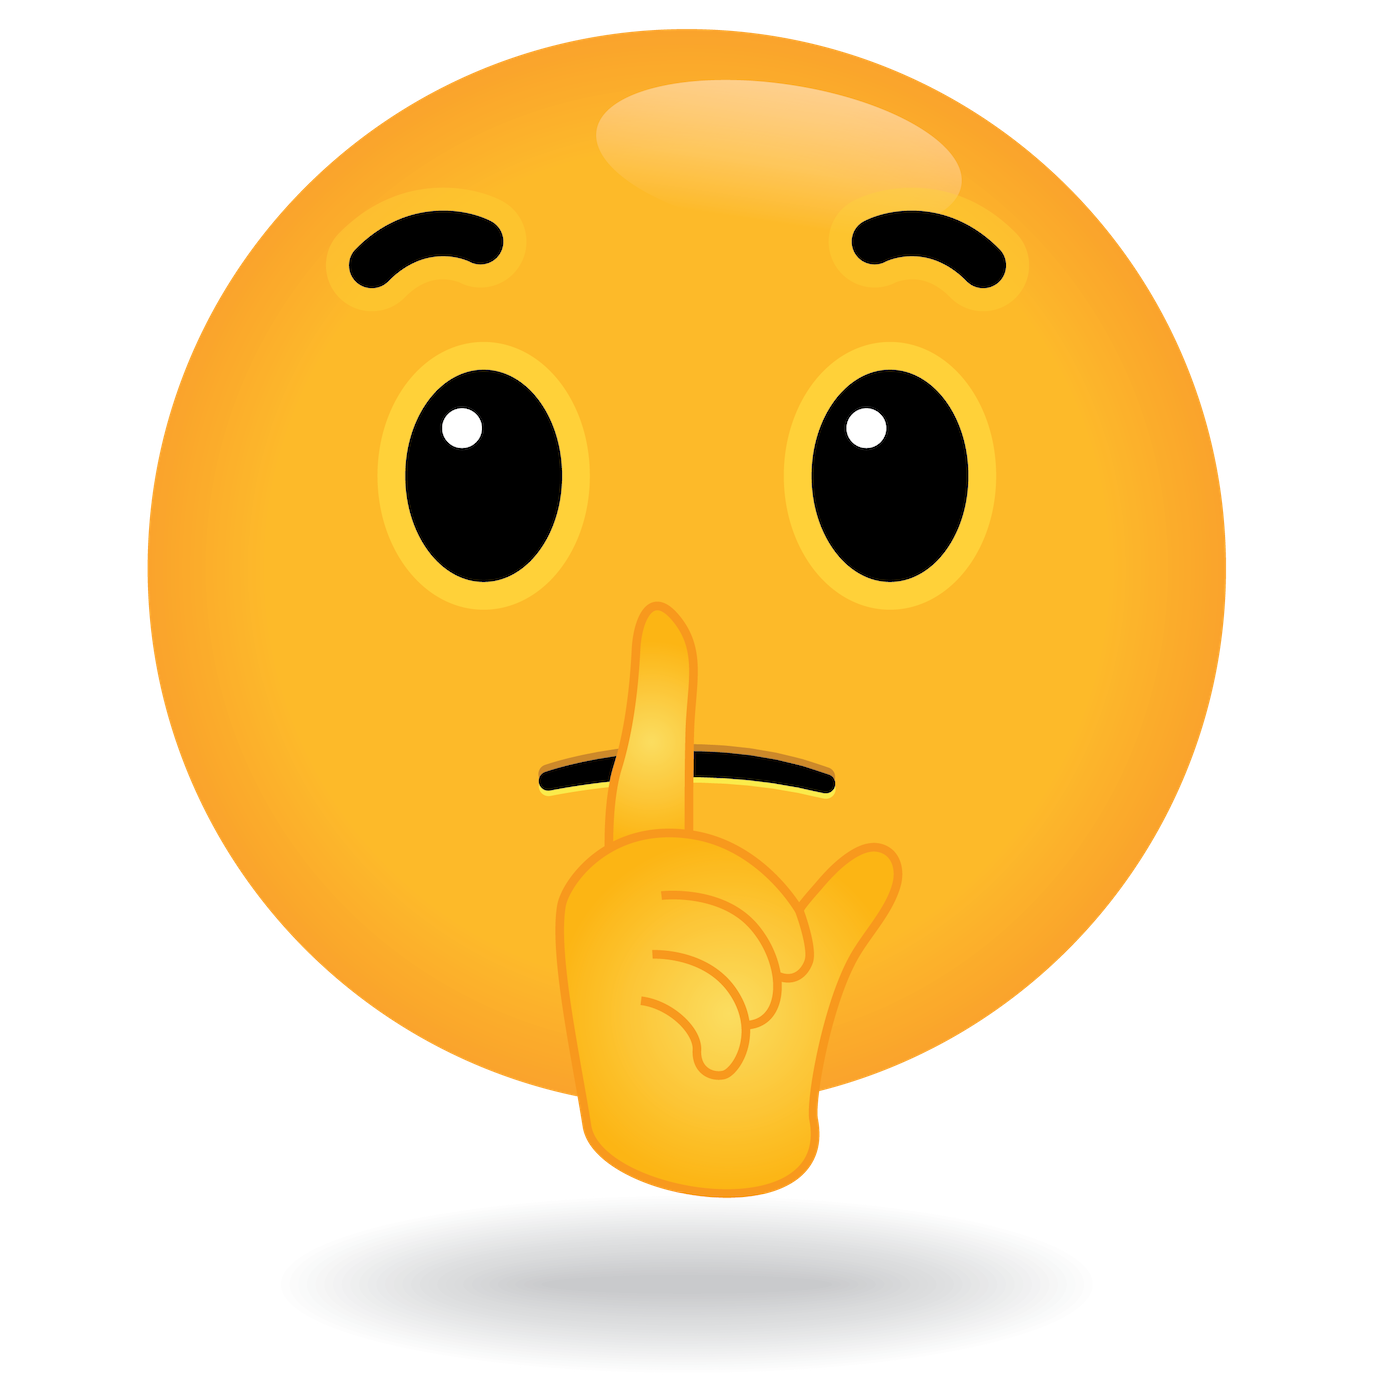 define awesome shhh quiet emoji